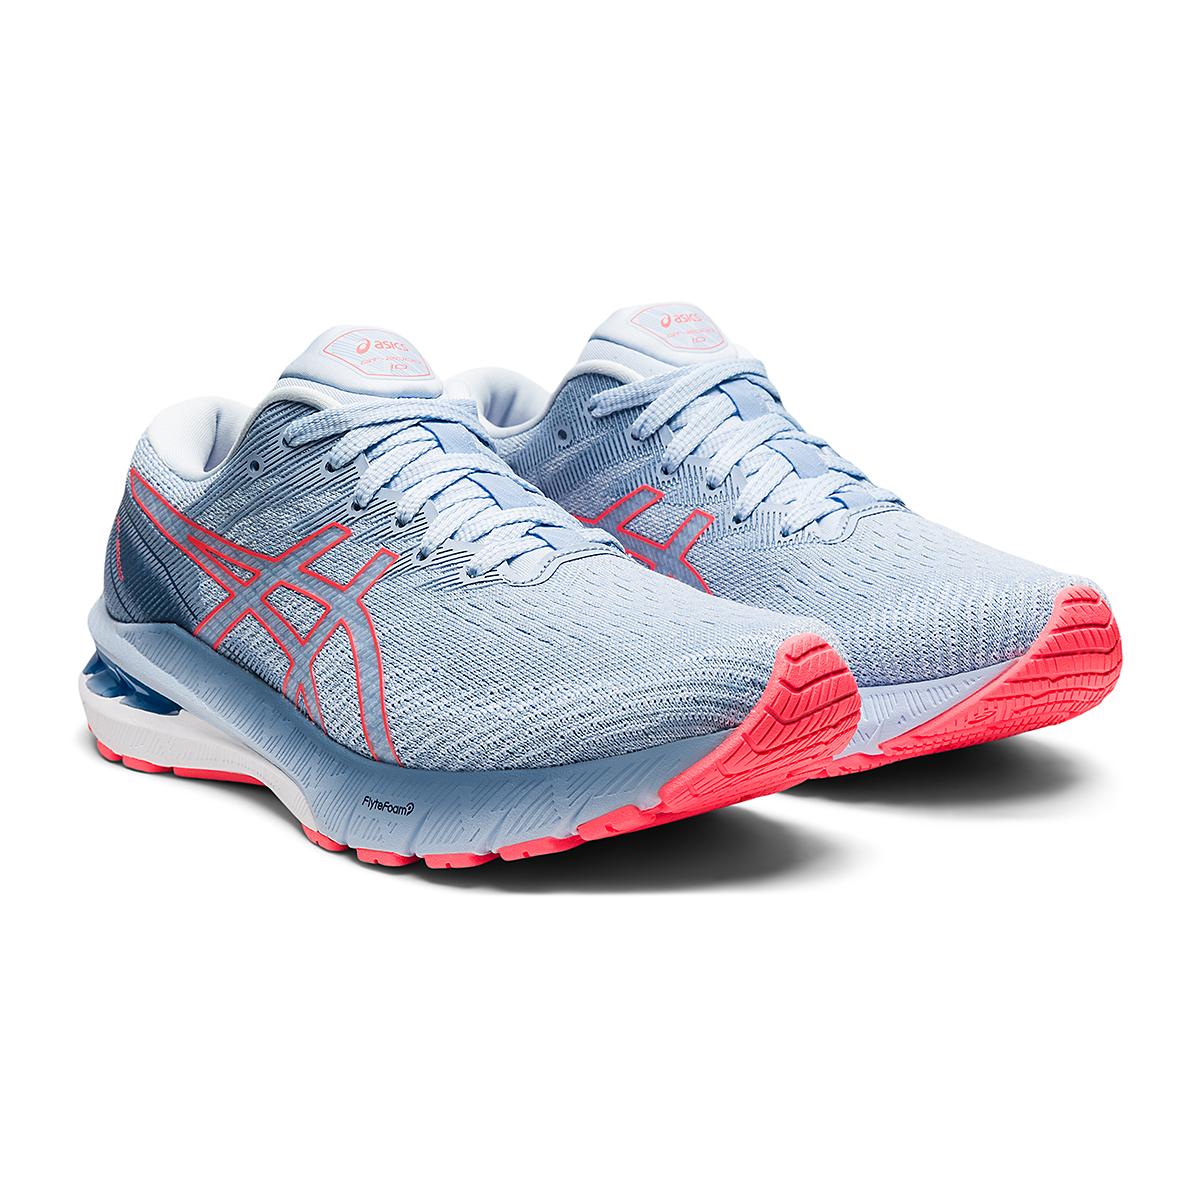 Women's Asics GT-2000 10 Running Shoe - Color: Mist/Blazing Coral - Size: 5 - Width: Regular, Mist/Blazing Coral, large, image 3